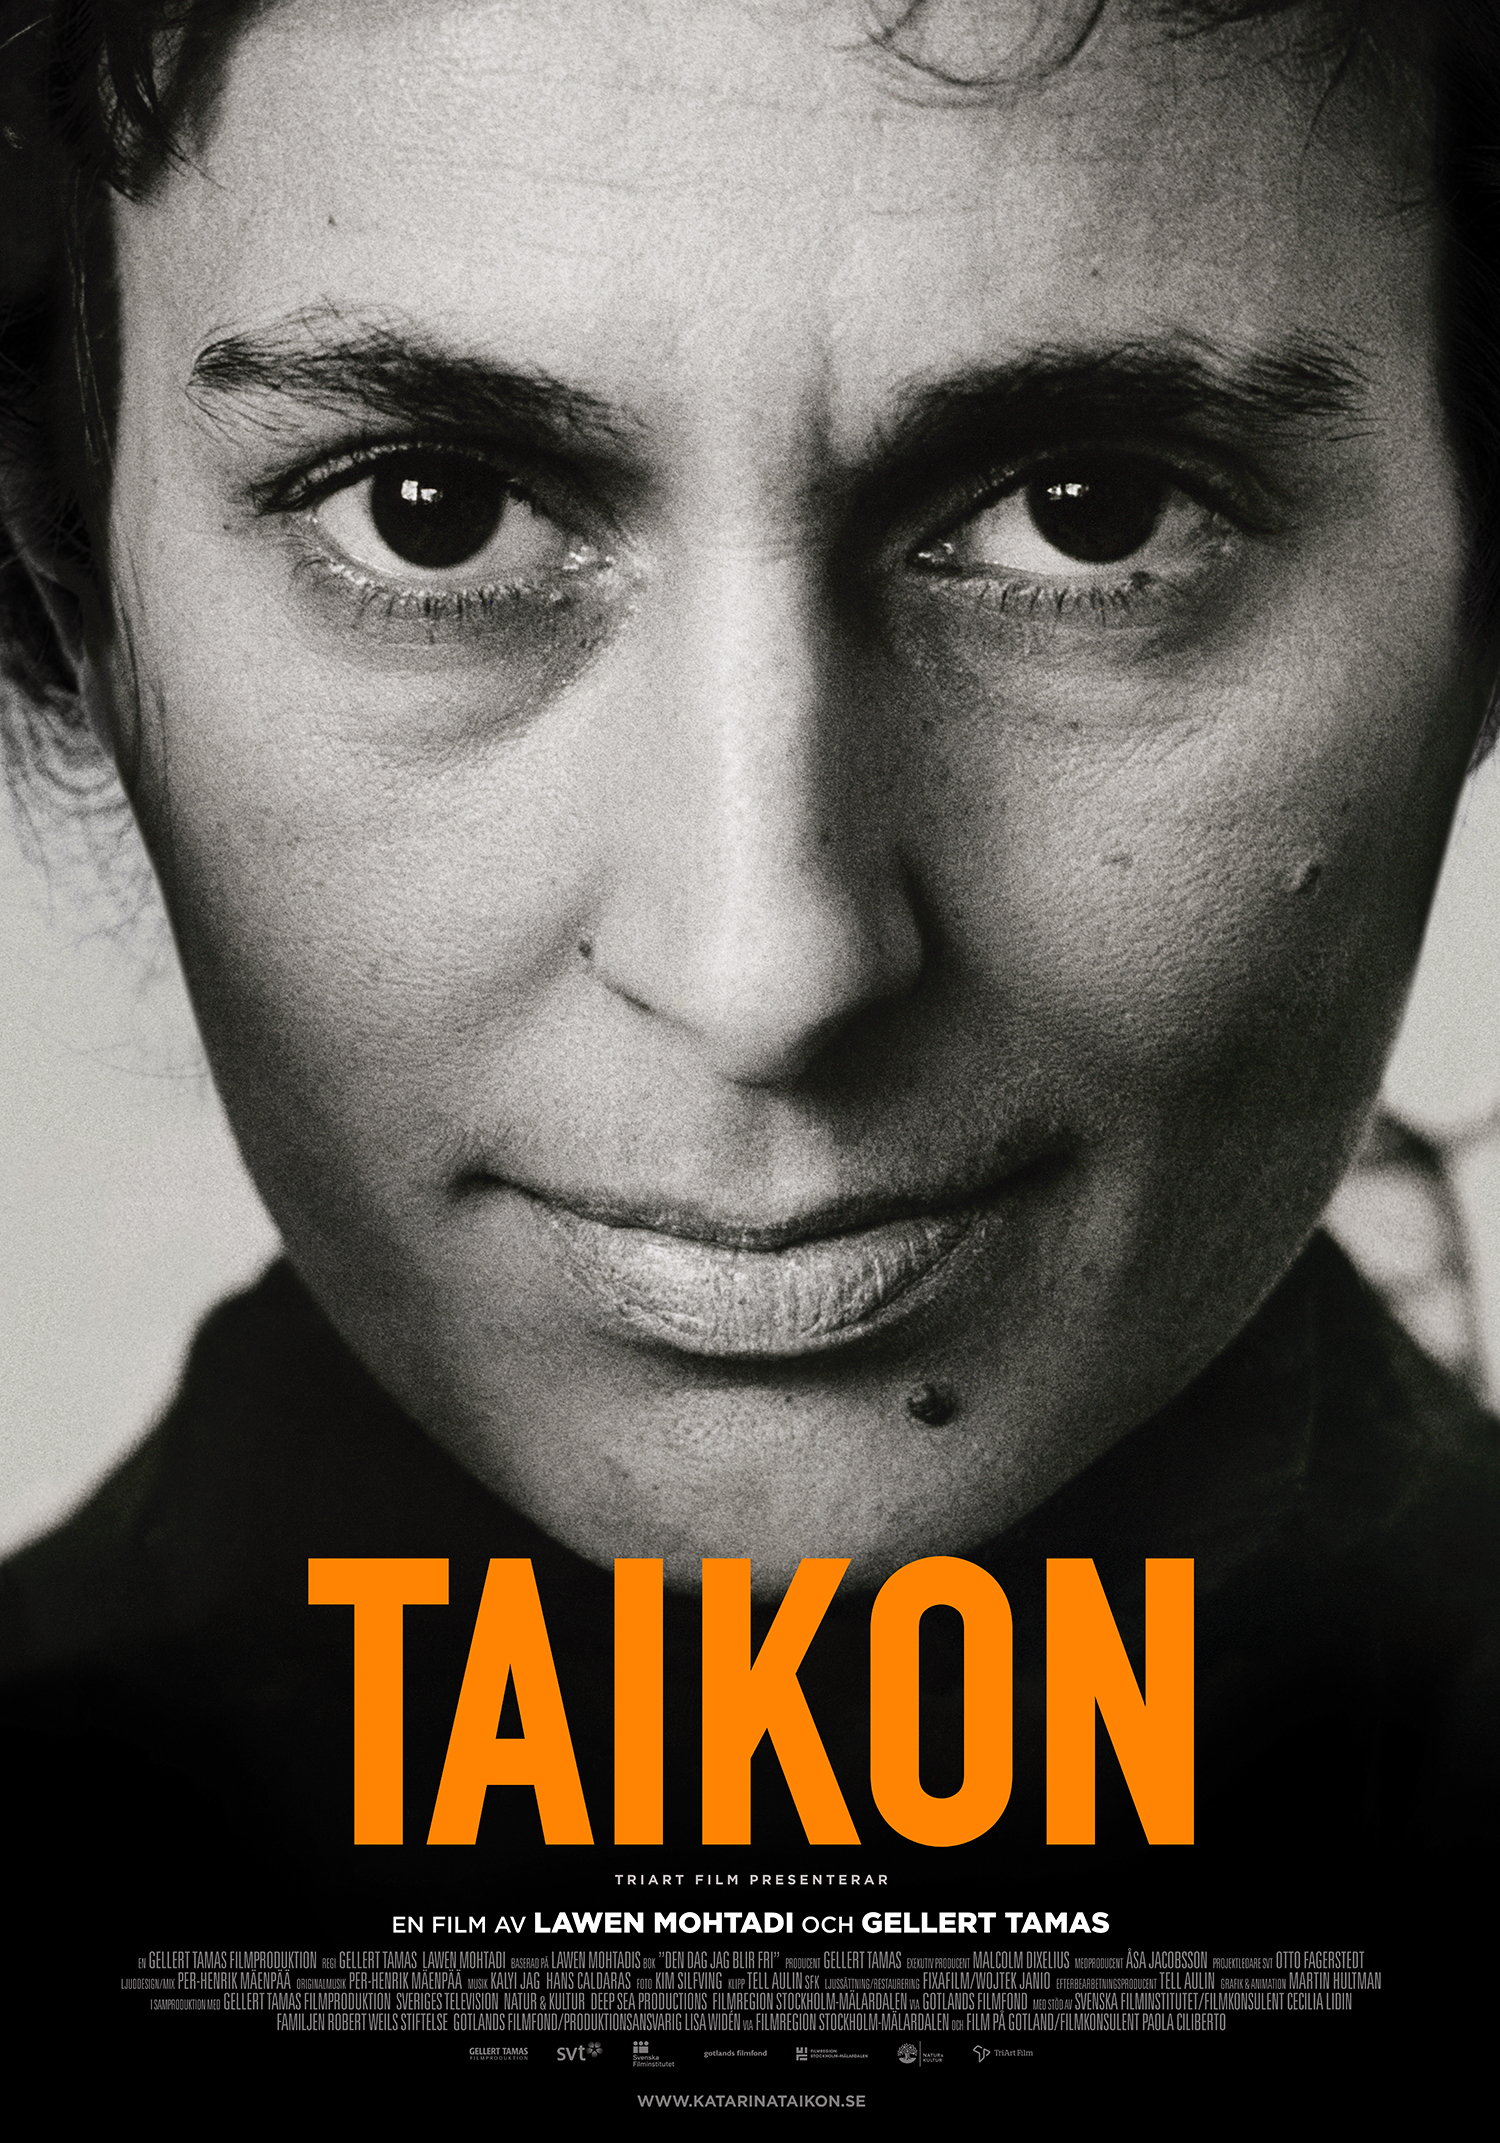 Taikon Official International Movie Poster